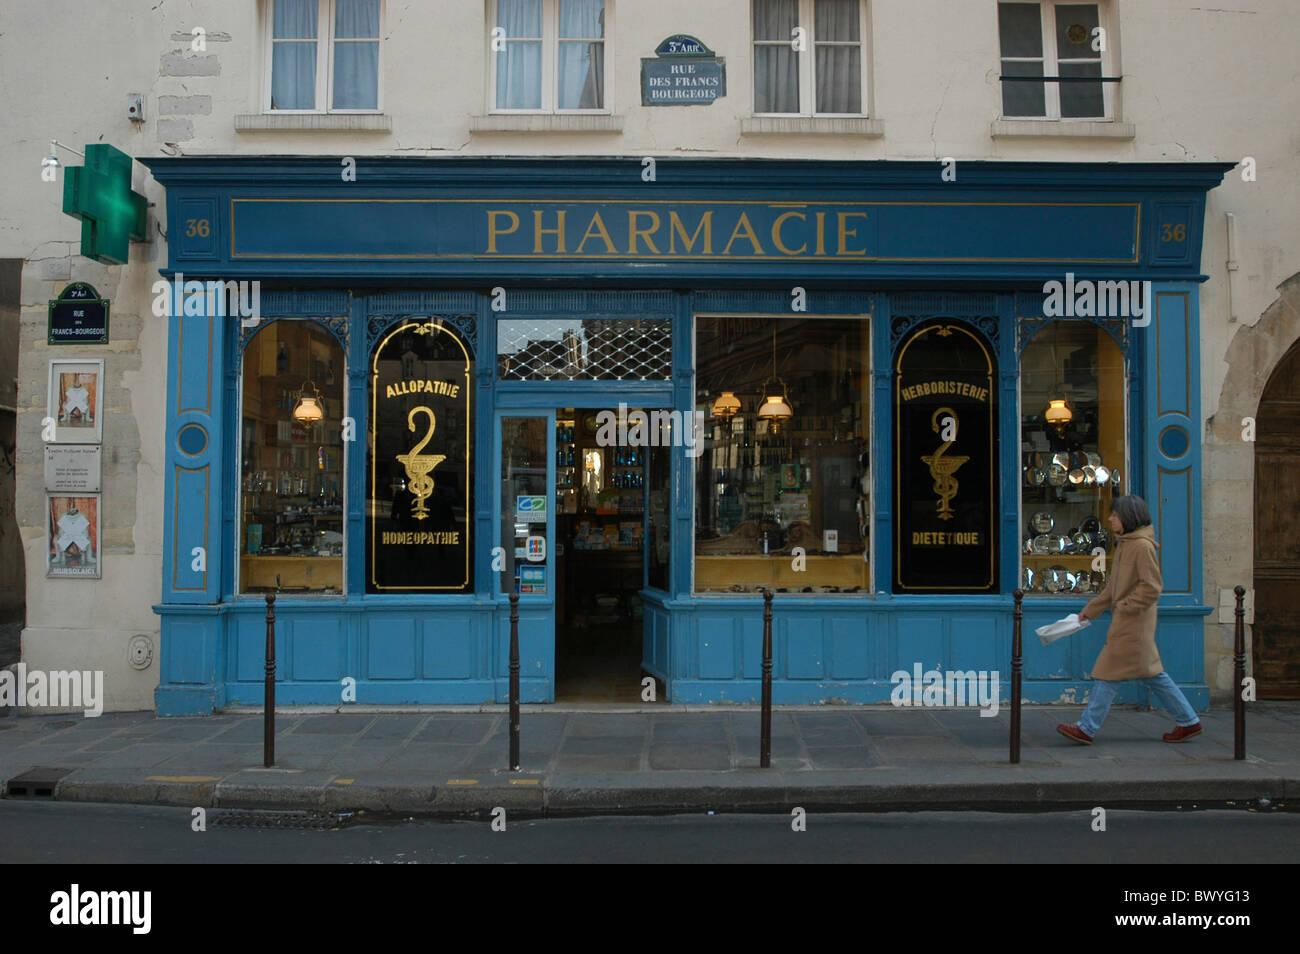 drugstore outside facade france europe stock photos. Black Bedroom Furniture Sets. Home Design Ideas